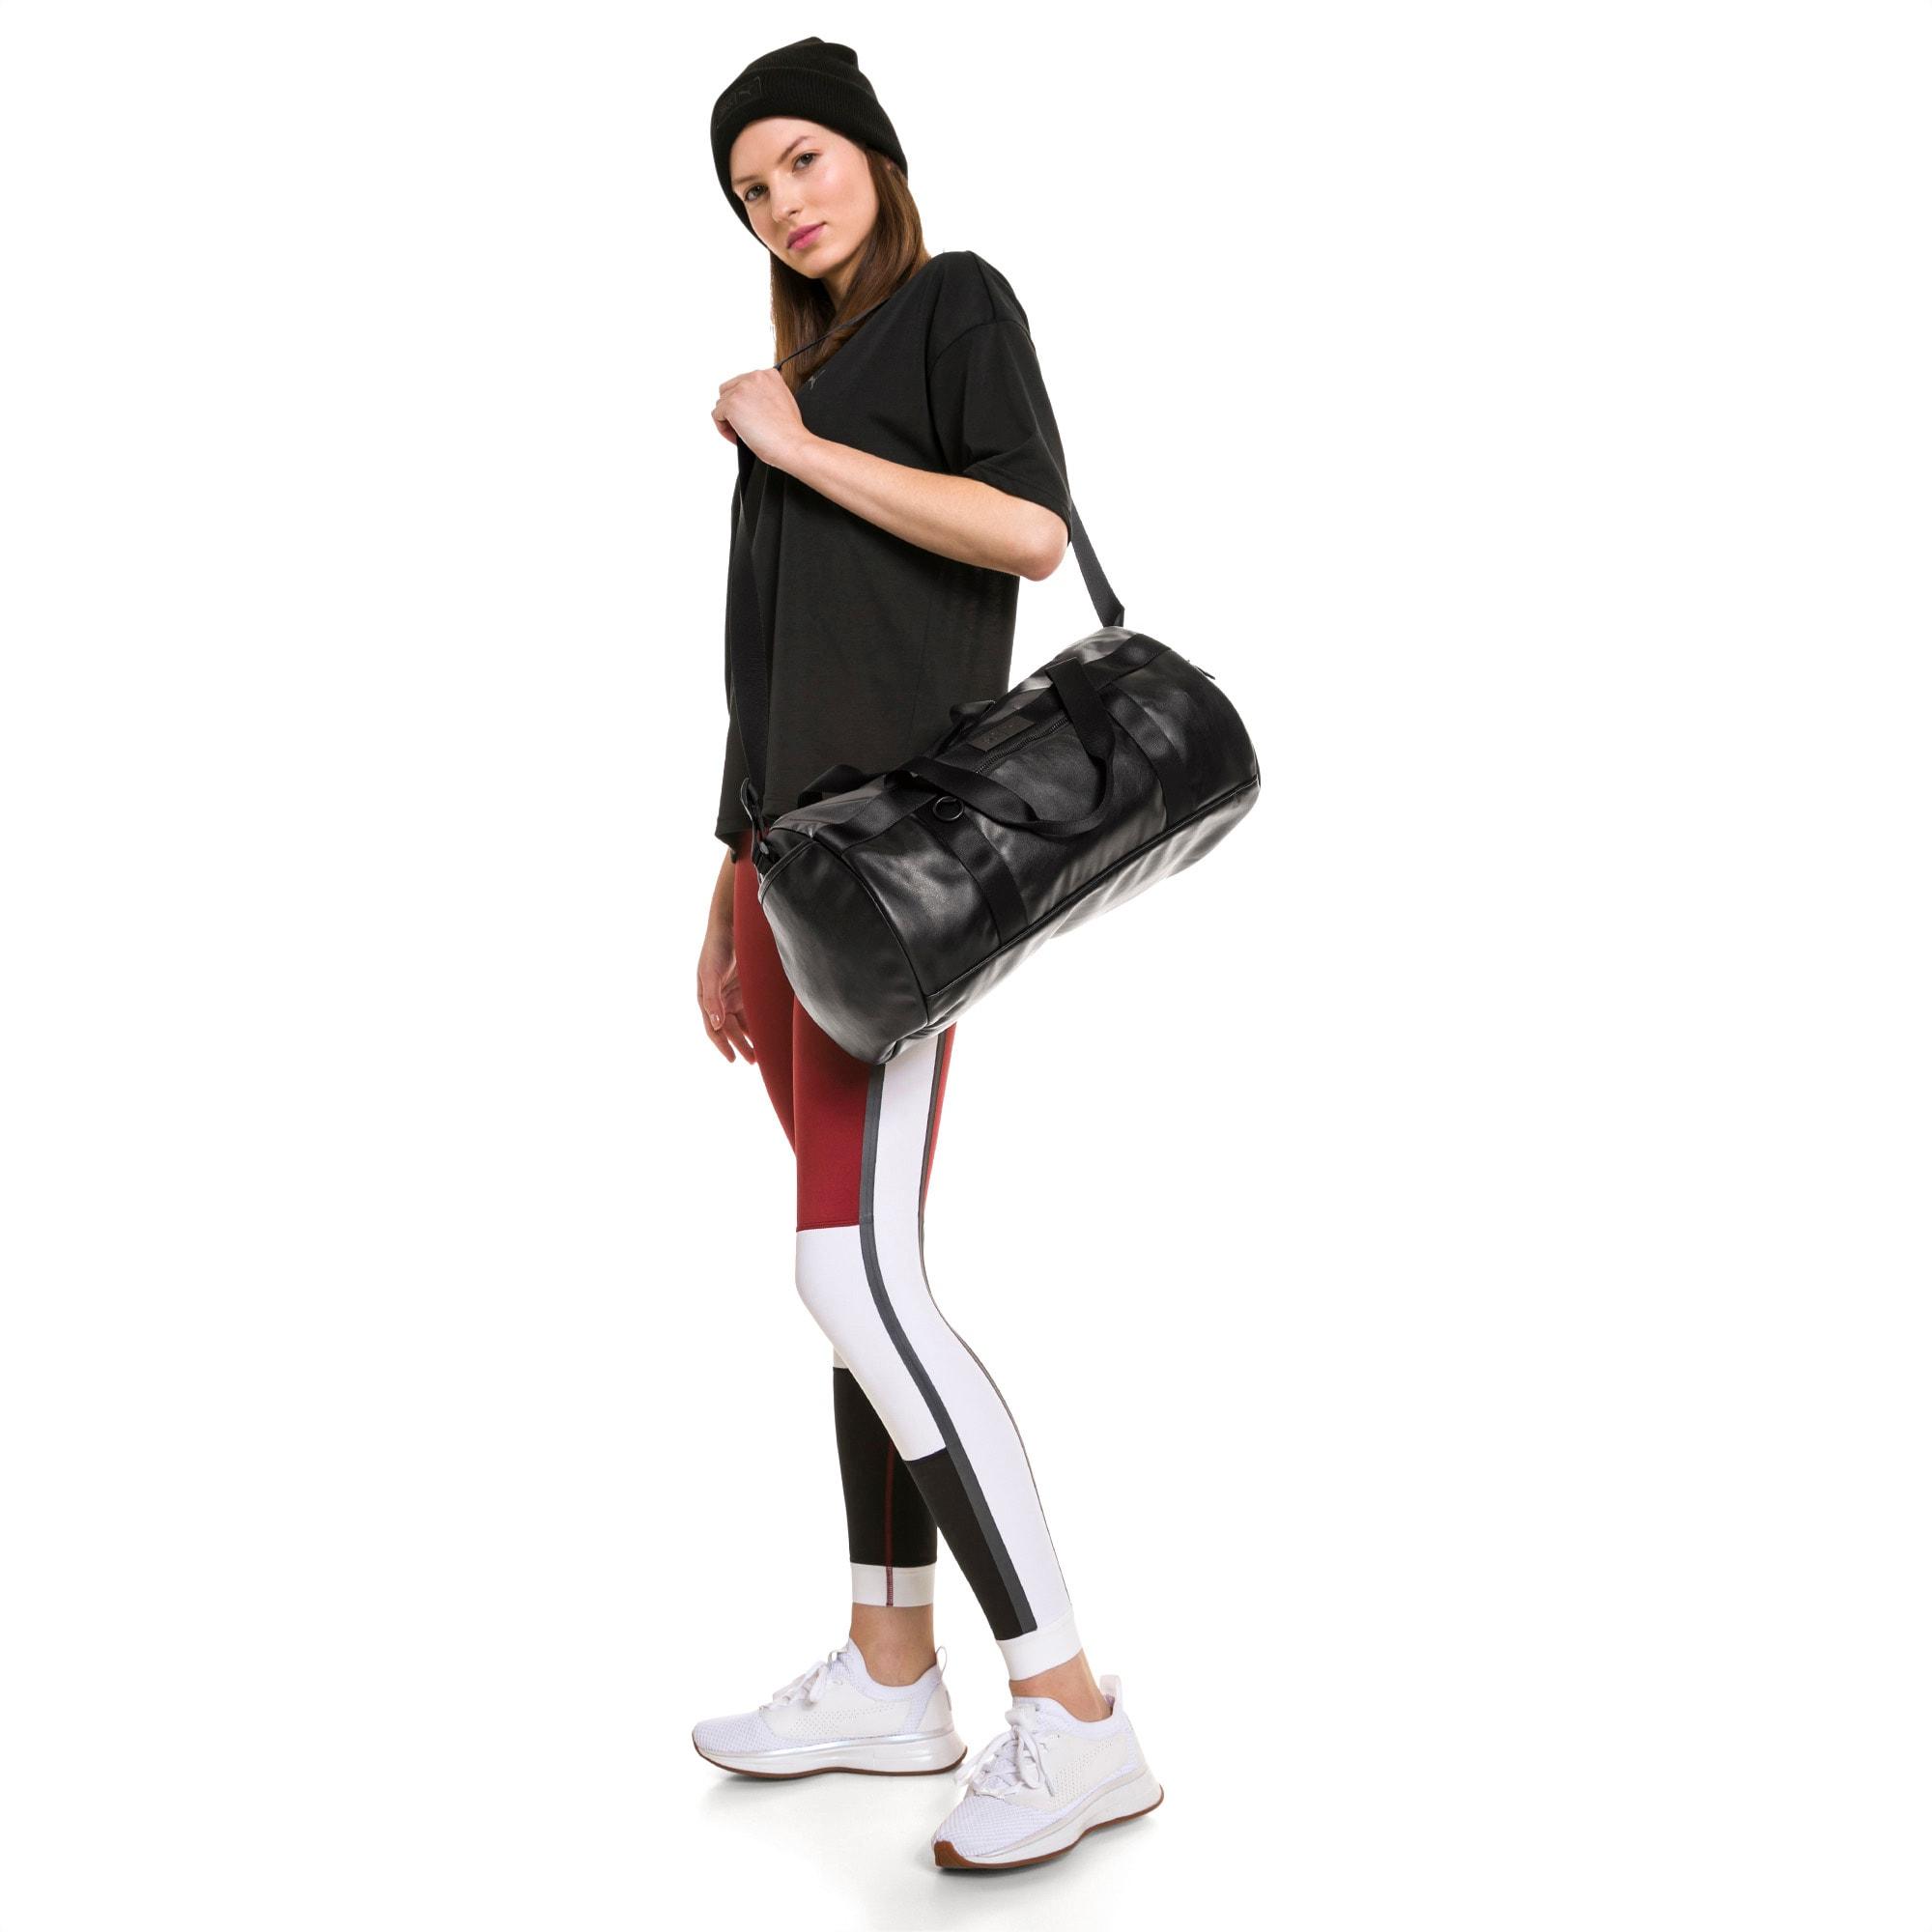 PUMA x SELENA GOMEZ pølsetaske til kvinder